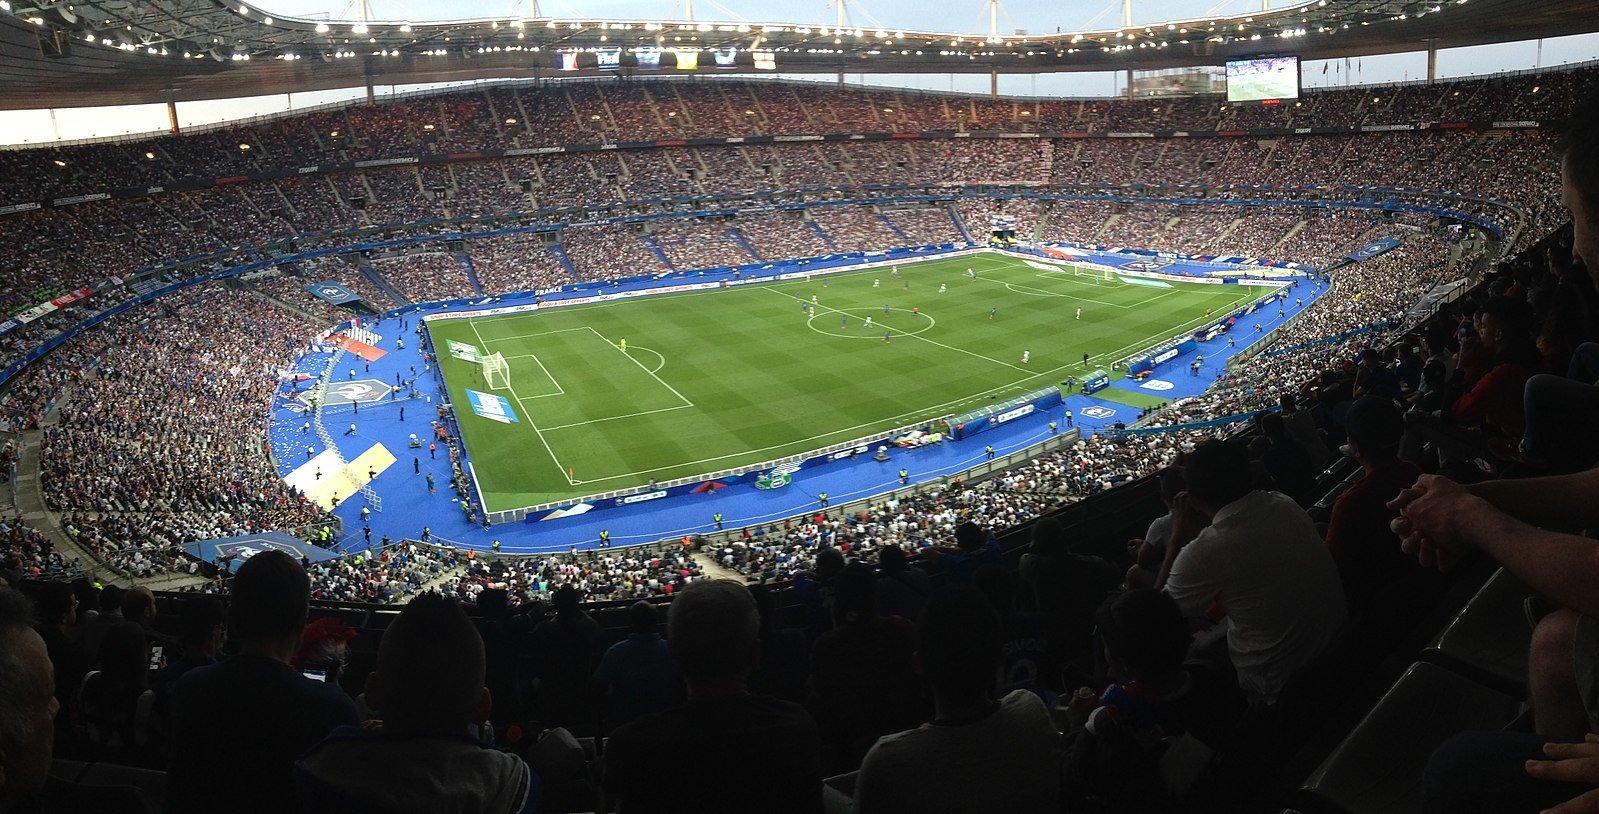 Paris sports